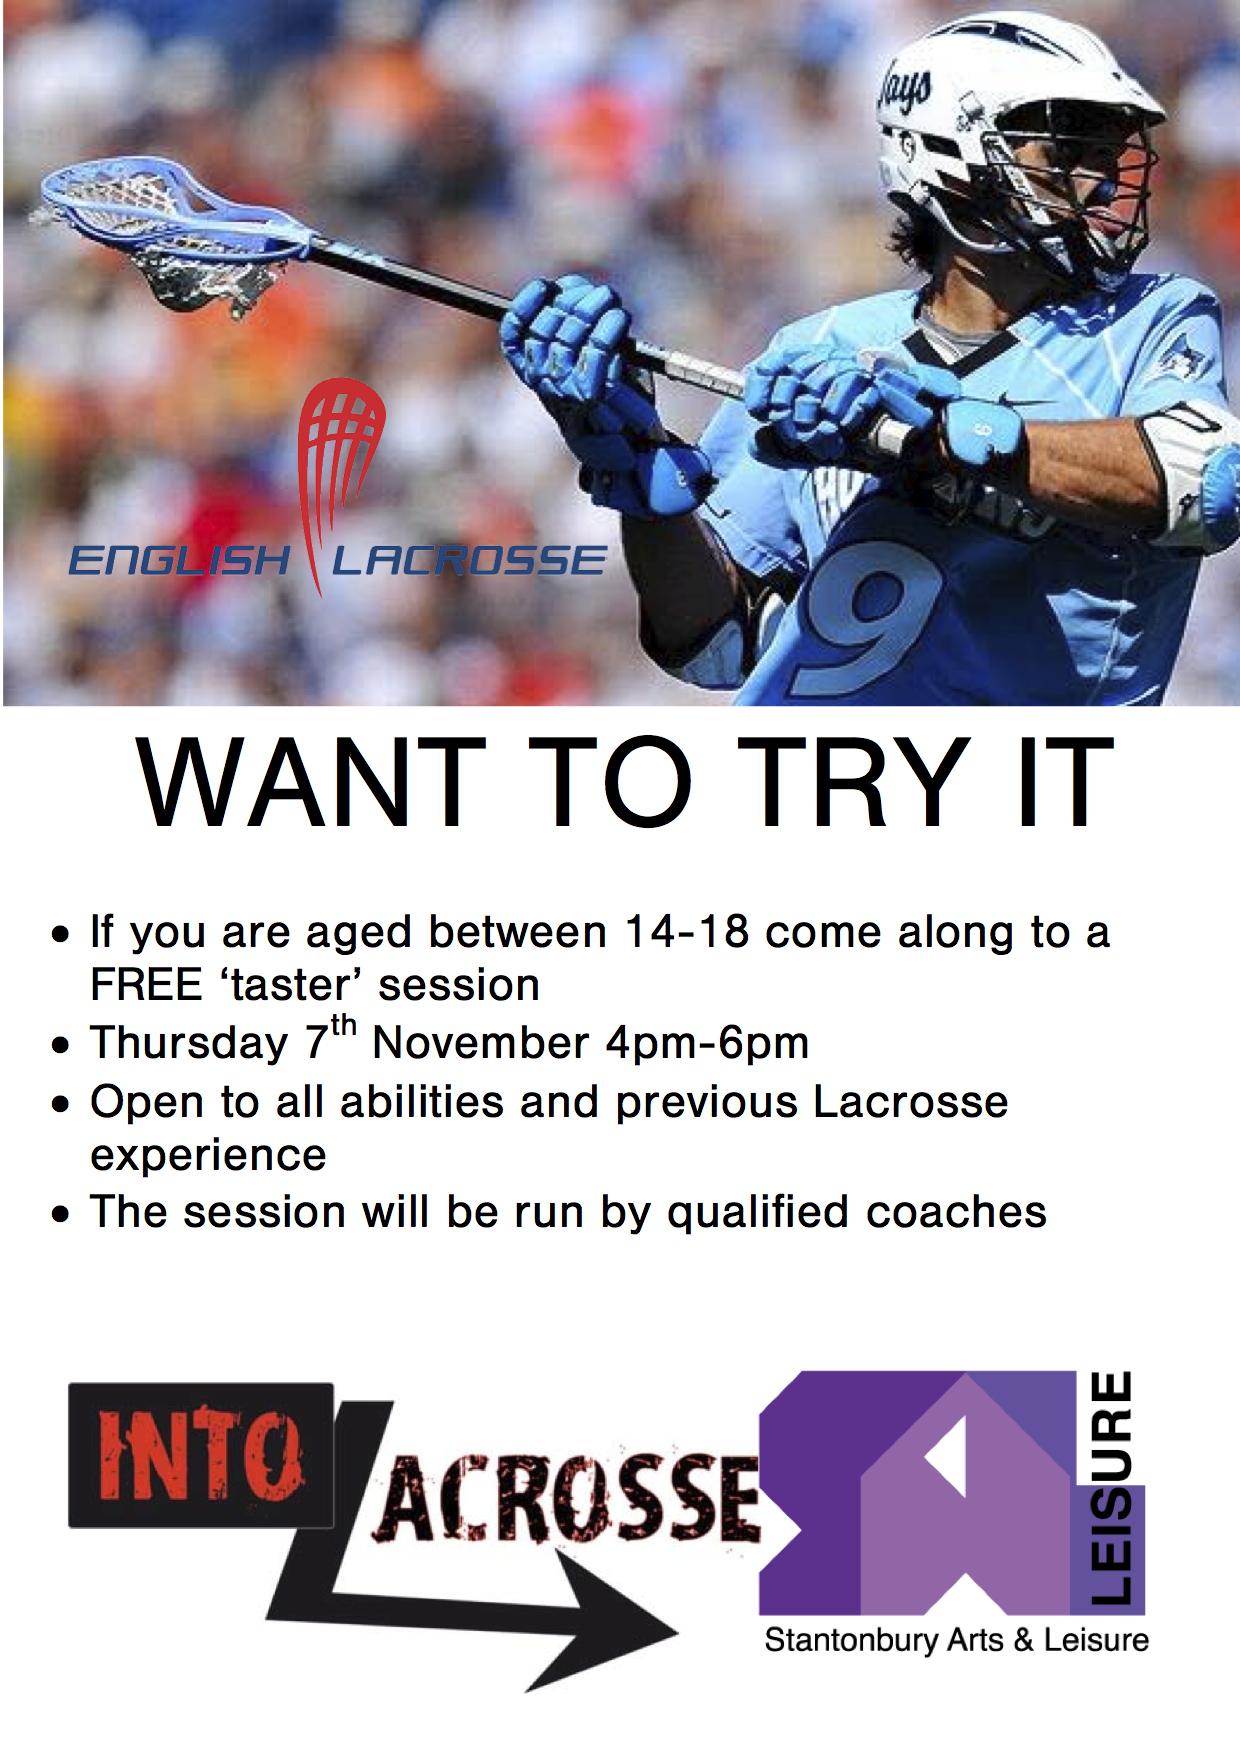 Free 'taster' session at Stantonbury for 14-18 yr boys and girls, Thu 7th Nov